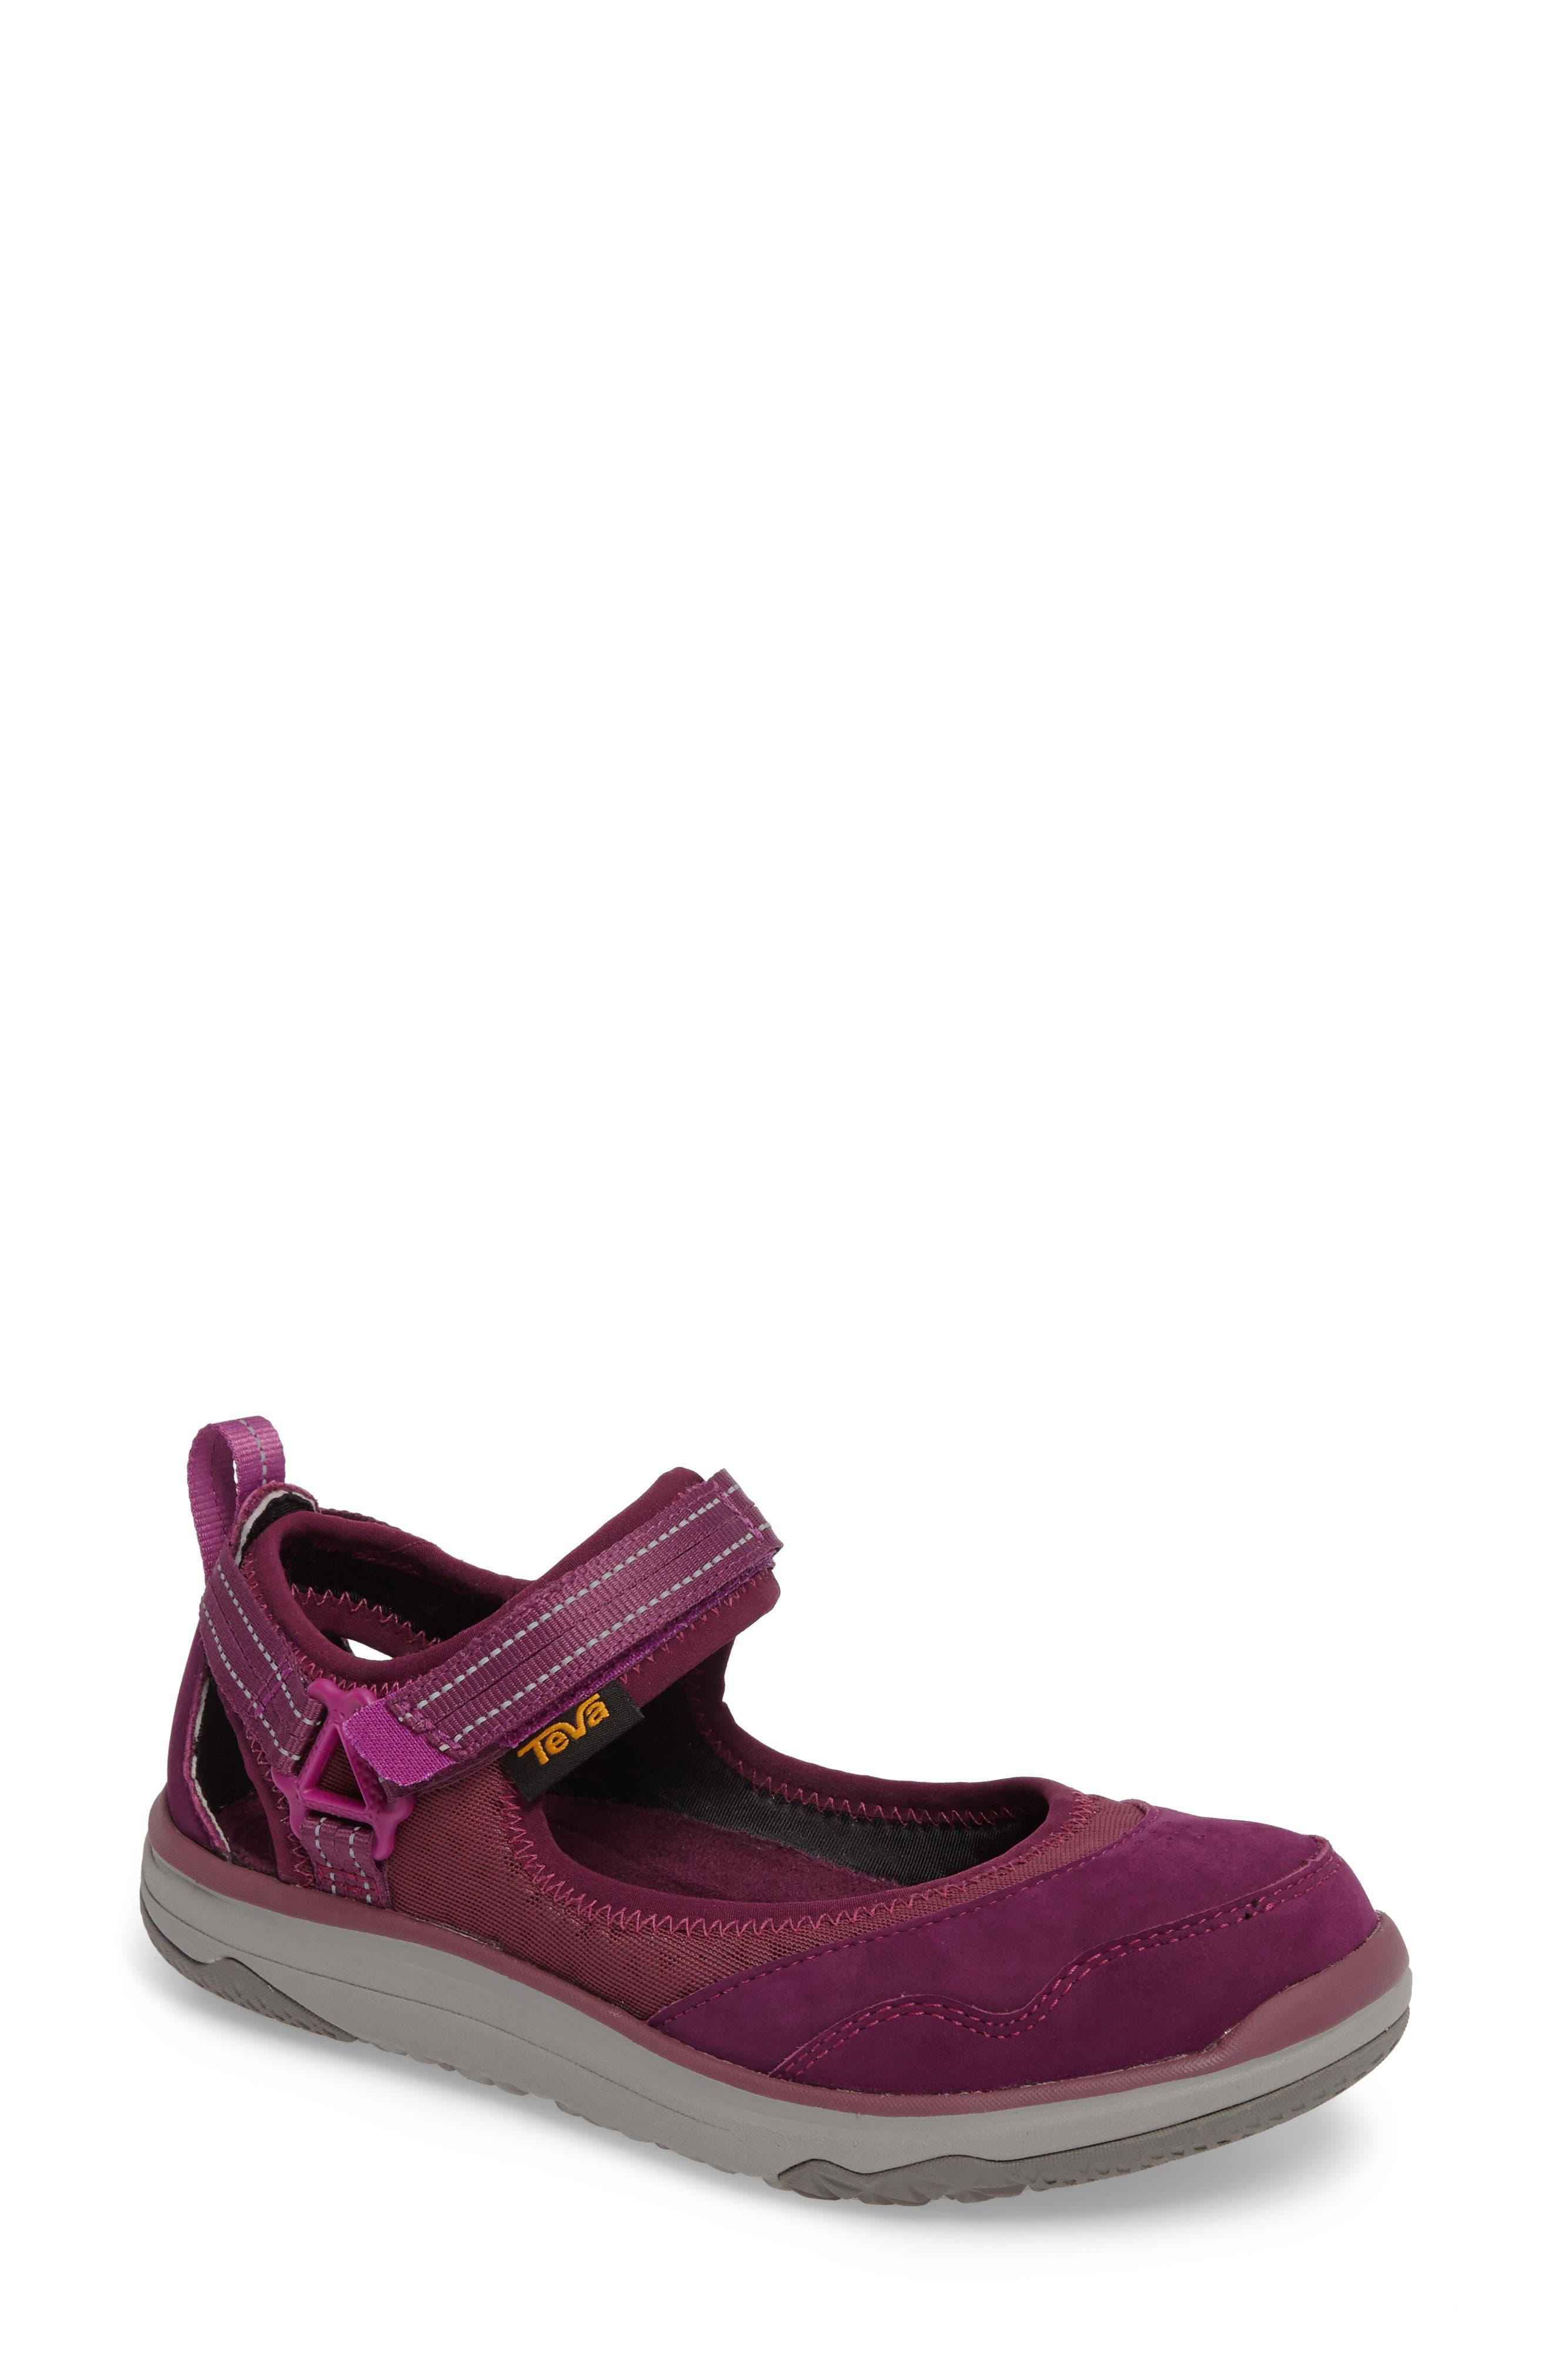 Terra Float Travel Mary Jane Flat,                         Main,                         color, Dark Purple Leather